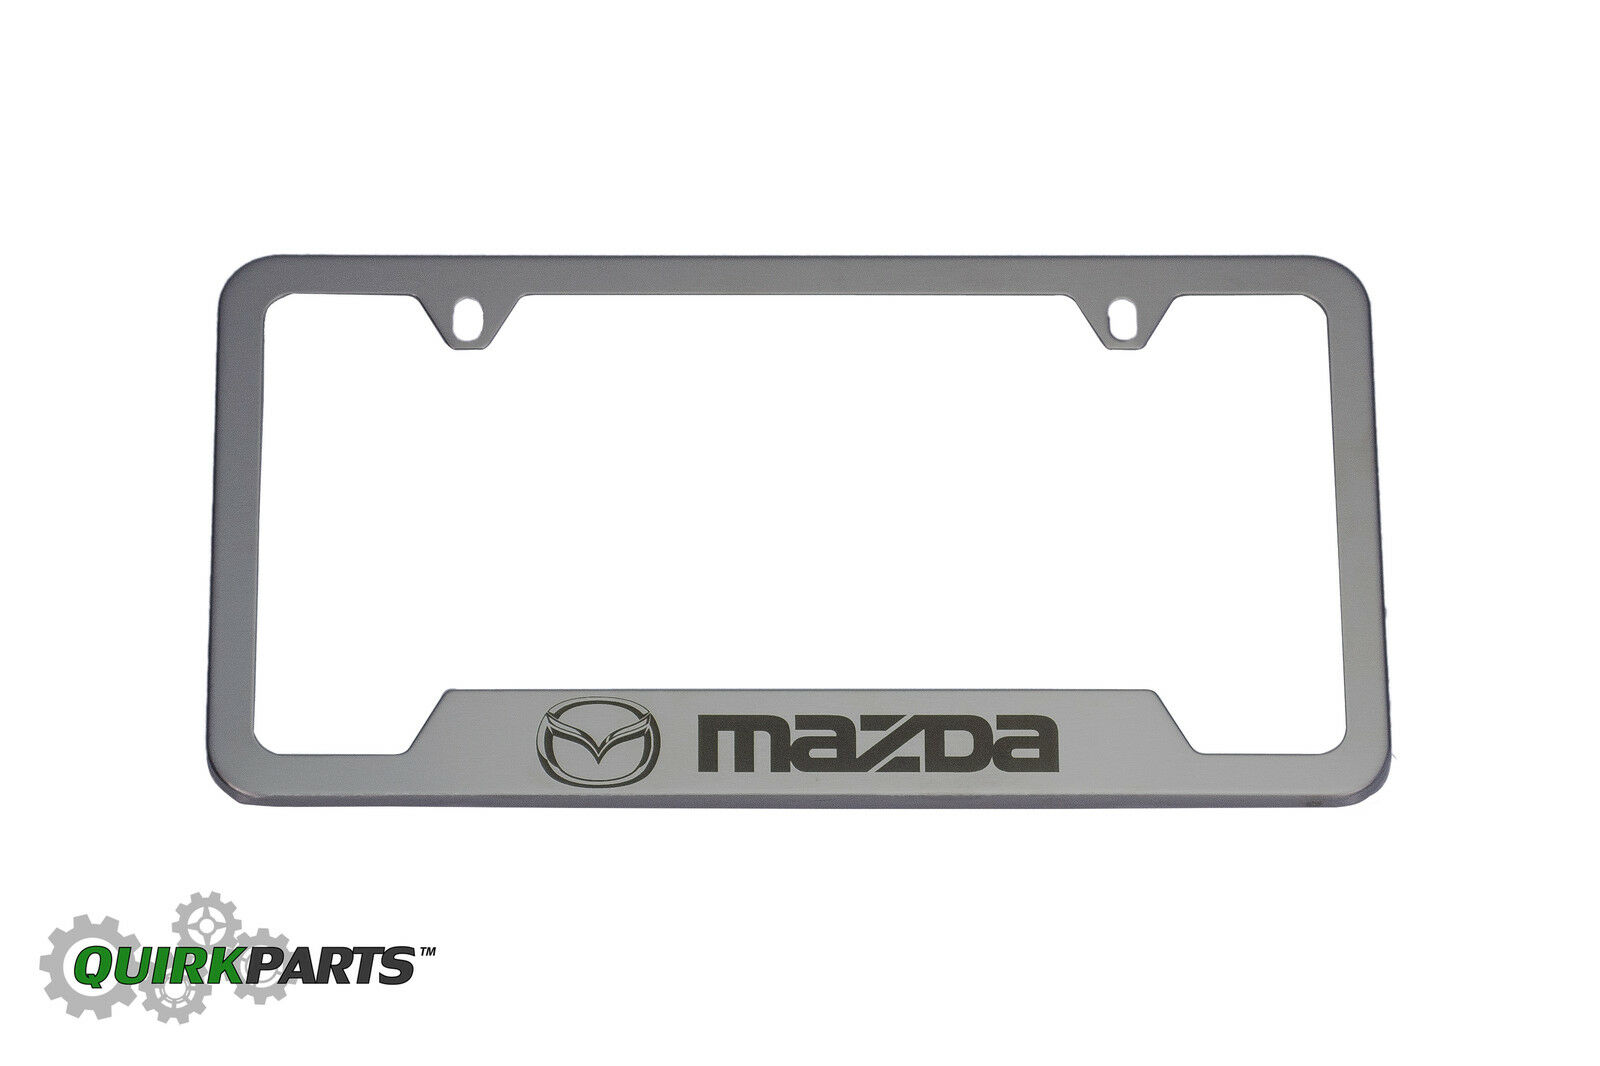 Mazda OEM Brushed Stainless Steel License Plate Frame | eBay